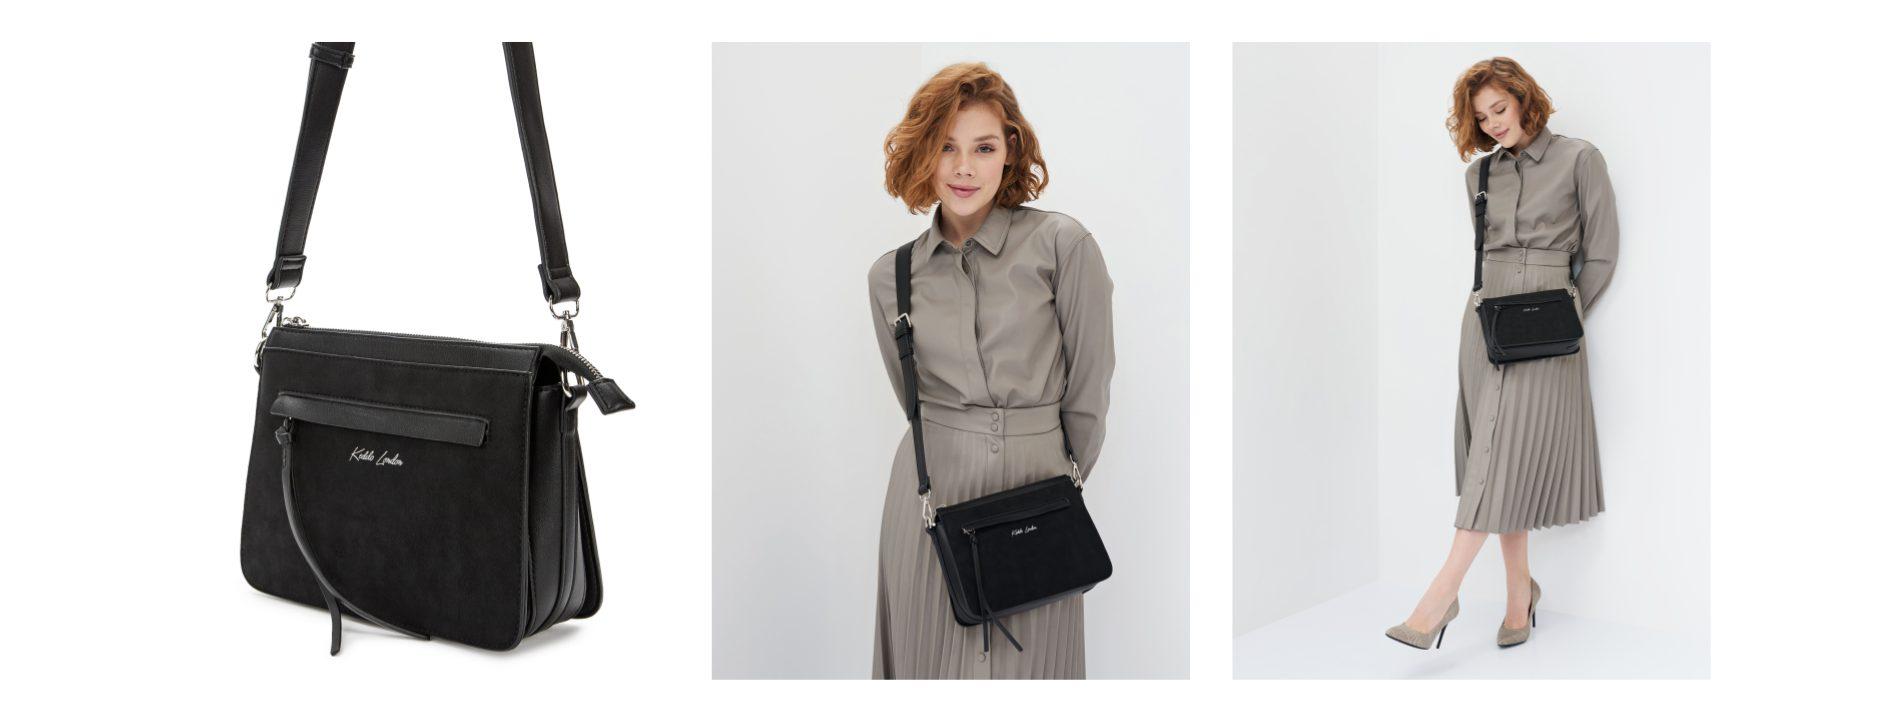 Anglické kabelky KEDDO potěší každou ženu.